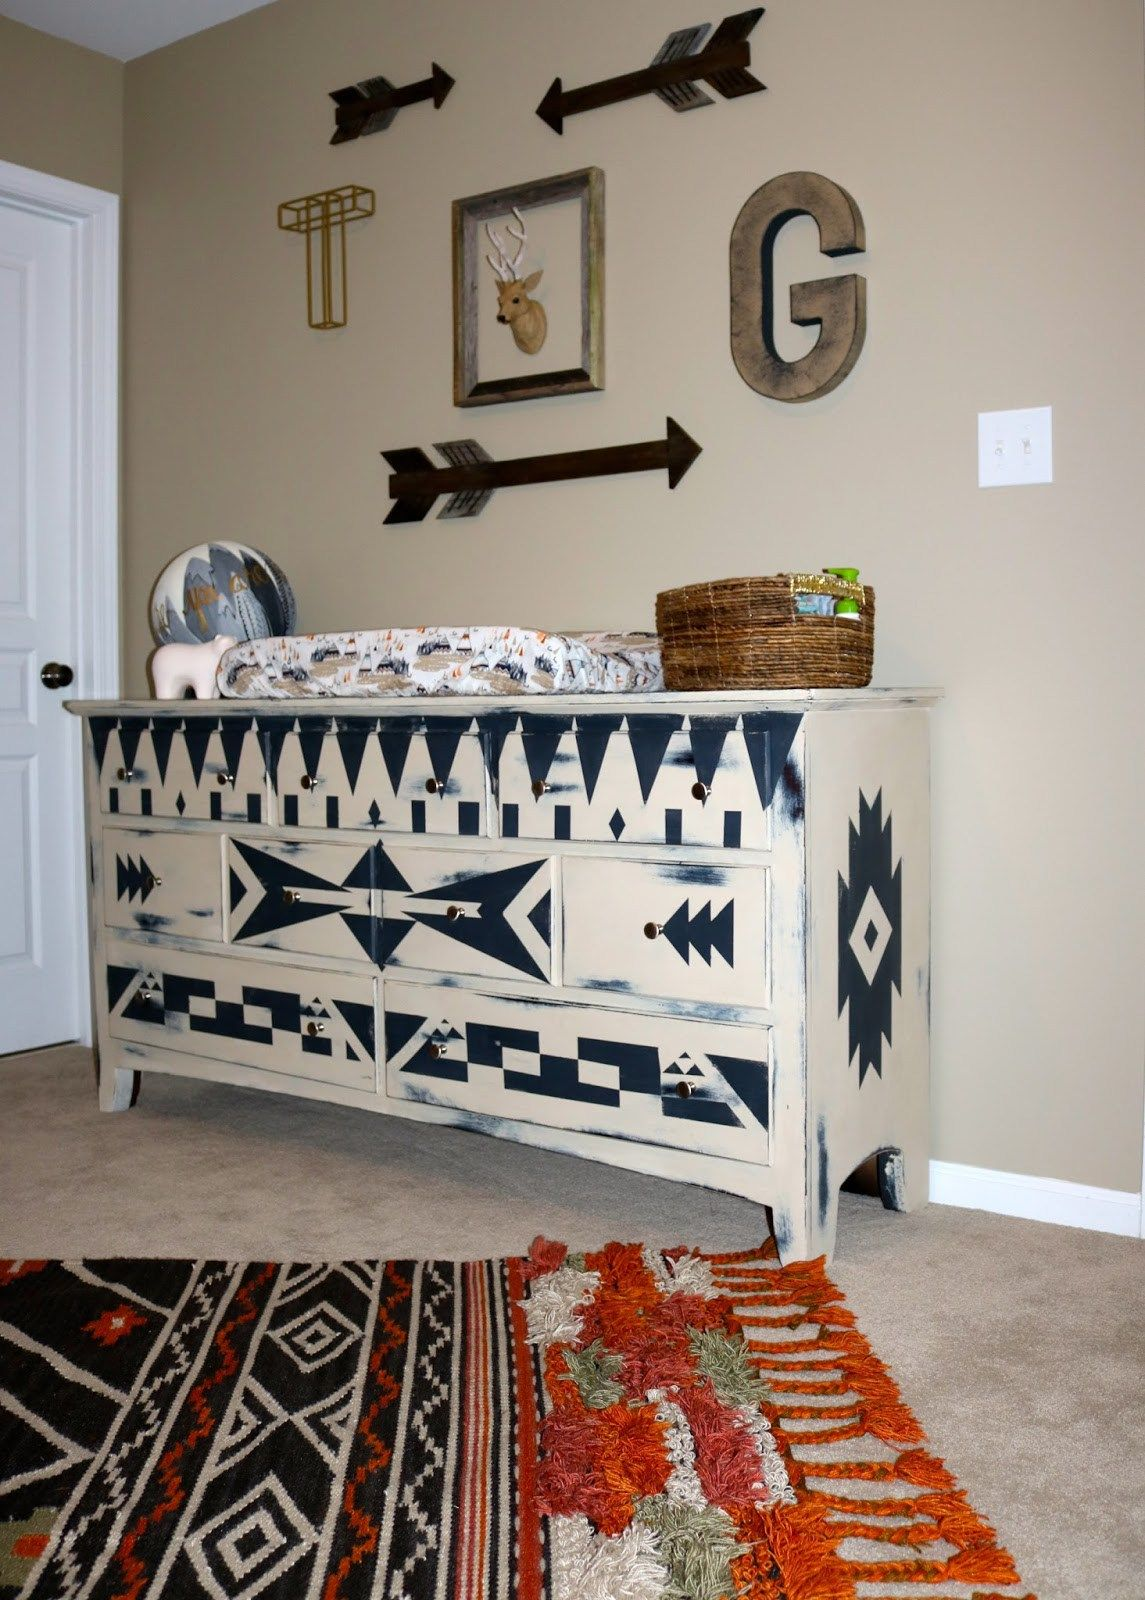 Pin de Lisa Smith en Painted furniture | Pinterest | Reciclado ...